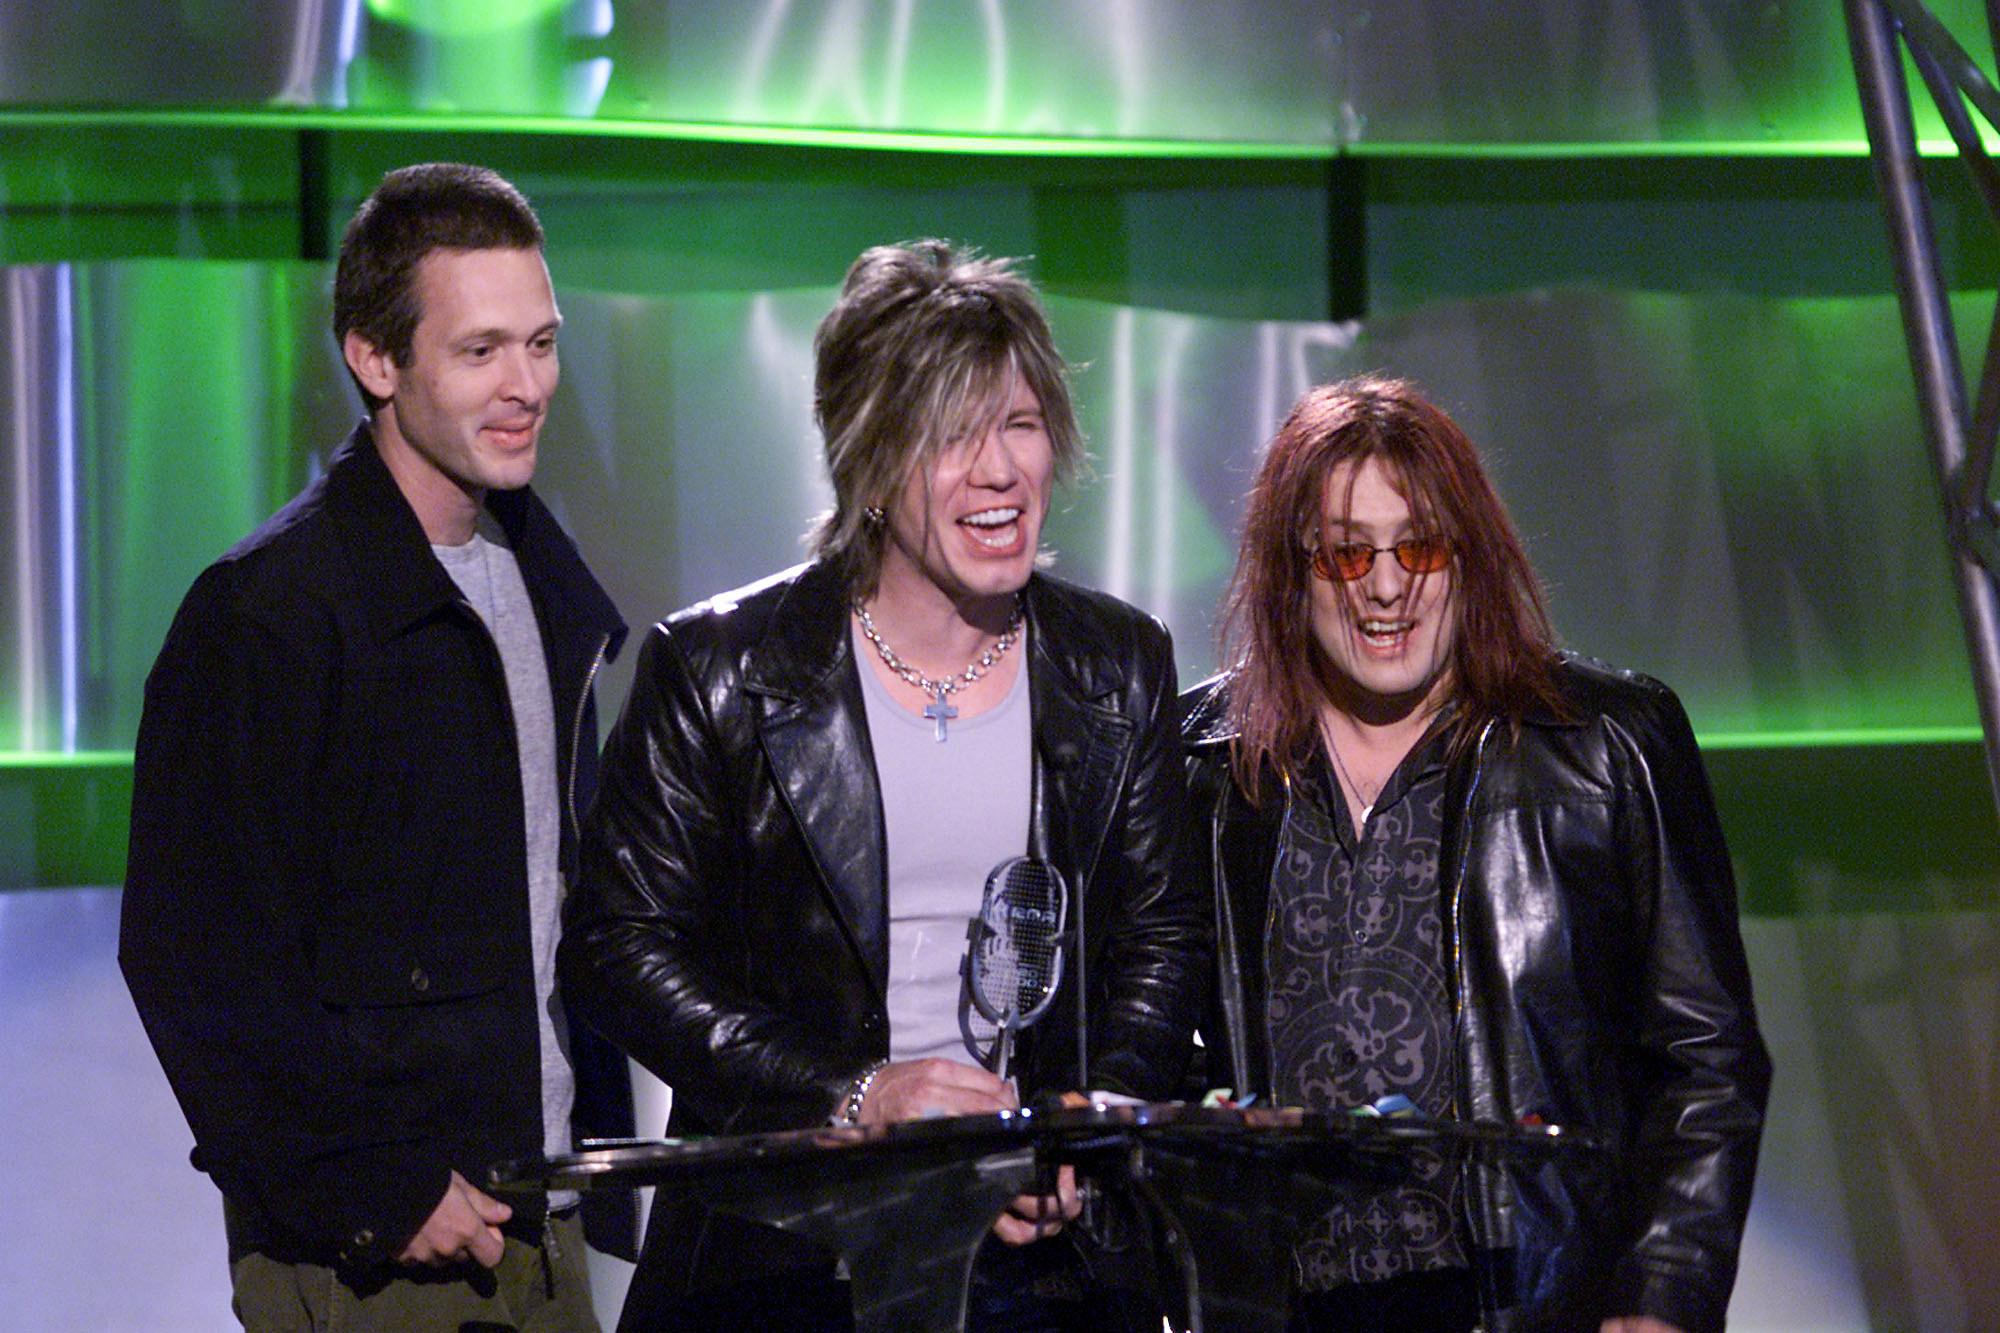 Goo Goo Dolls accepting an award